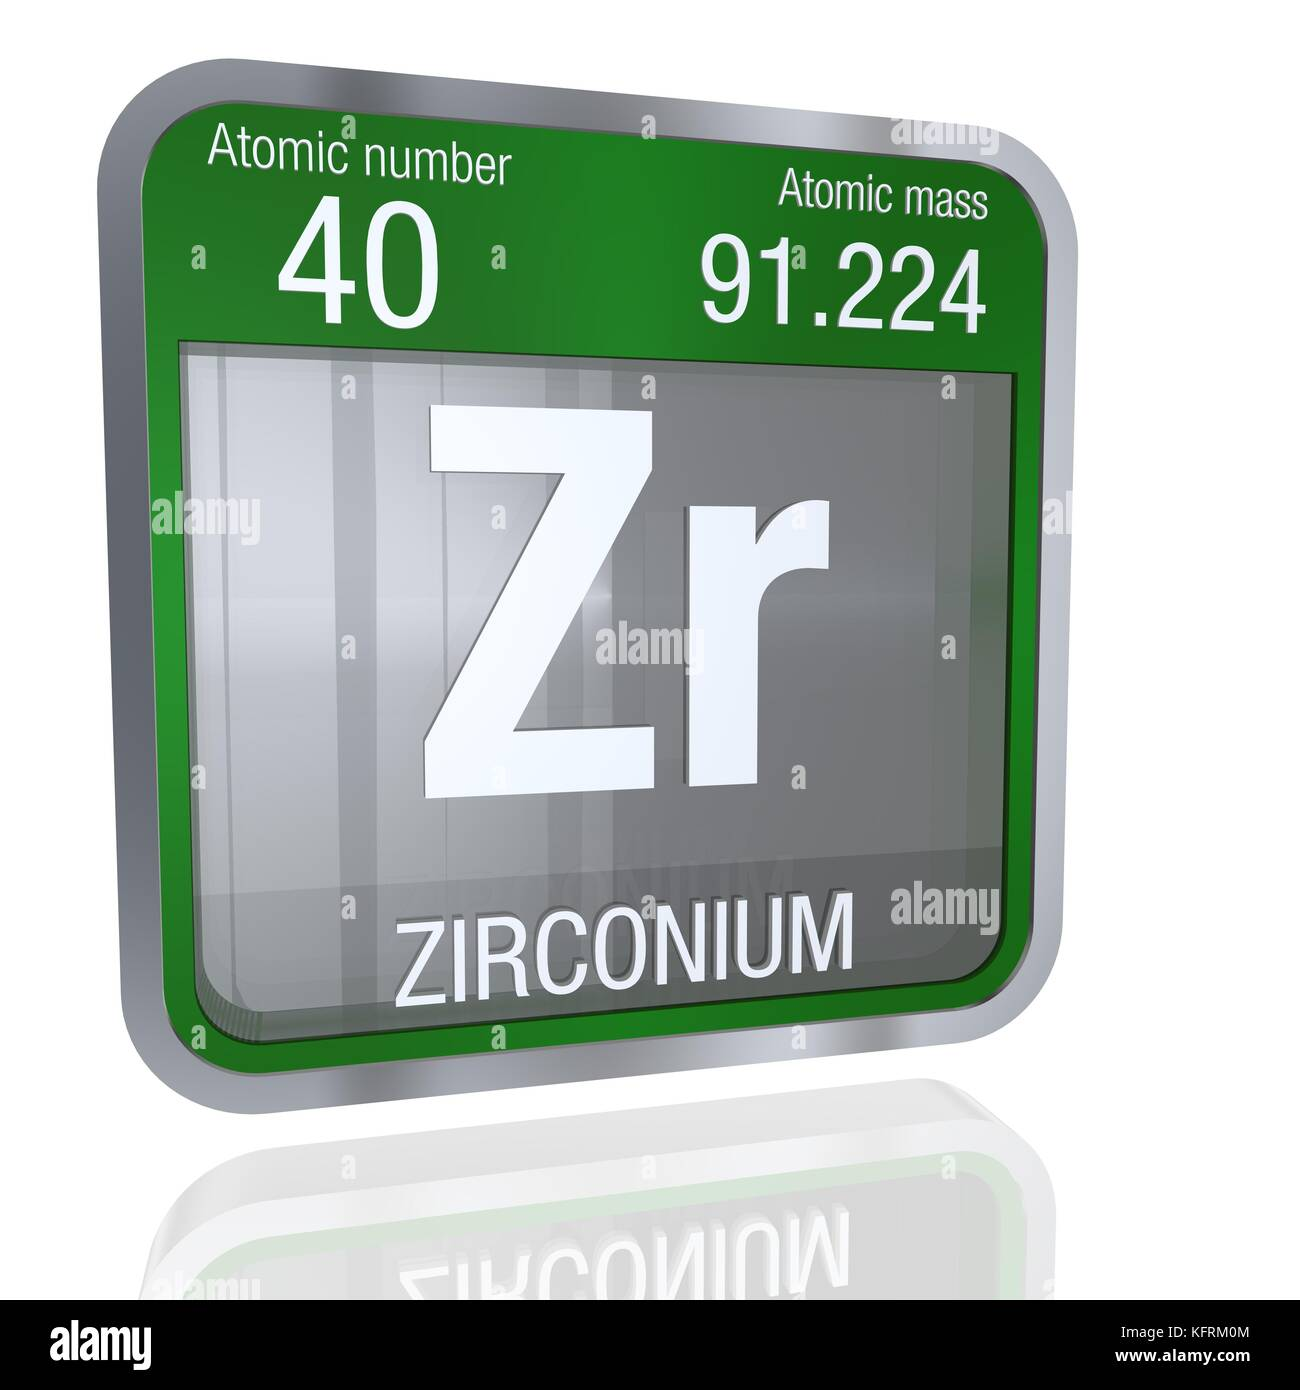 Zirconium stock photos zirconium stock images alamy zirconium symbol in square shape with metallic border and transparent background with reflection on the floor gamestrikefo Images